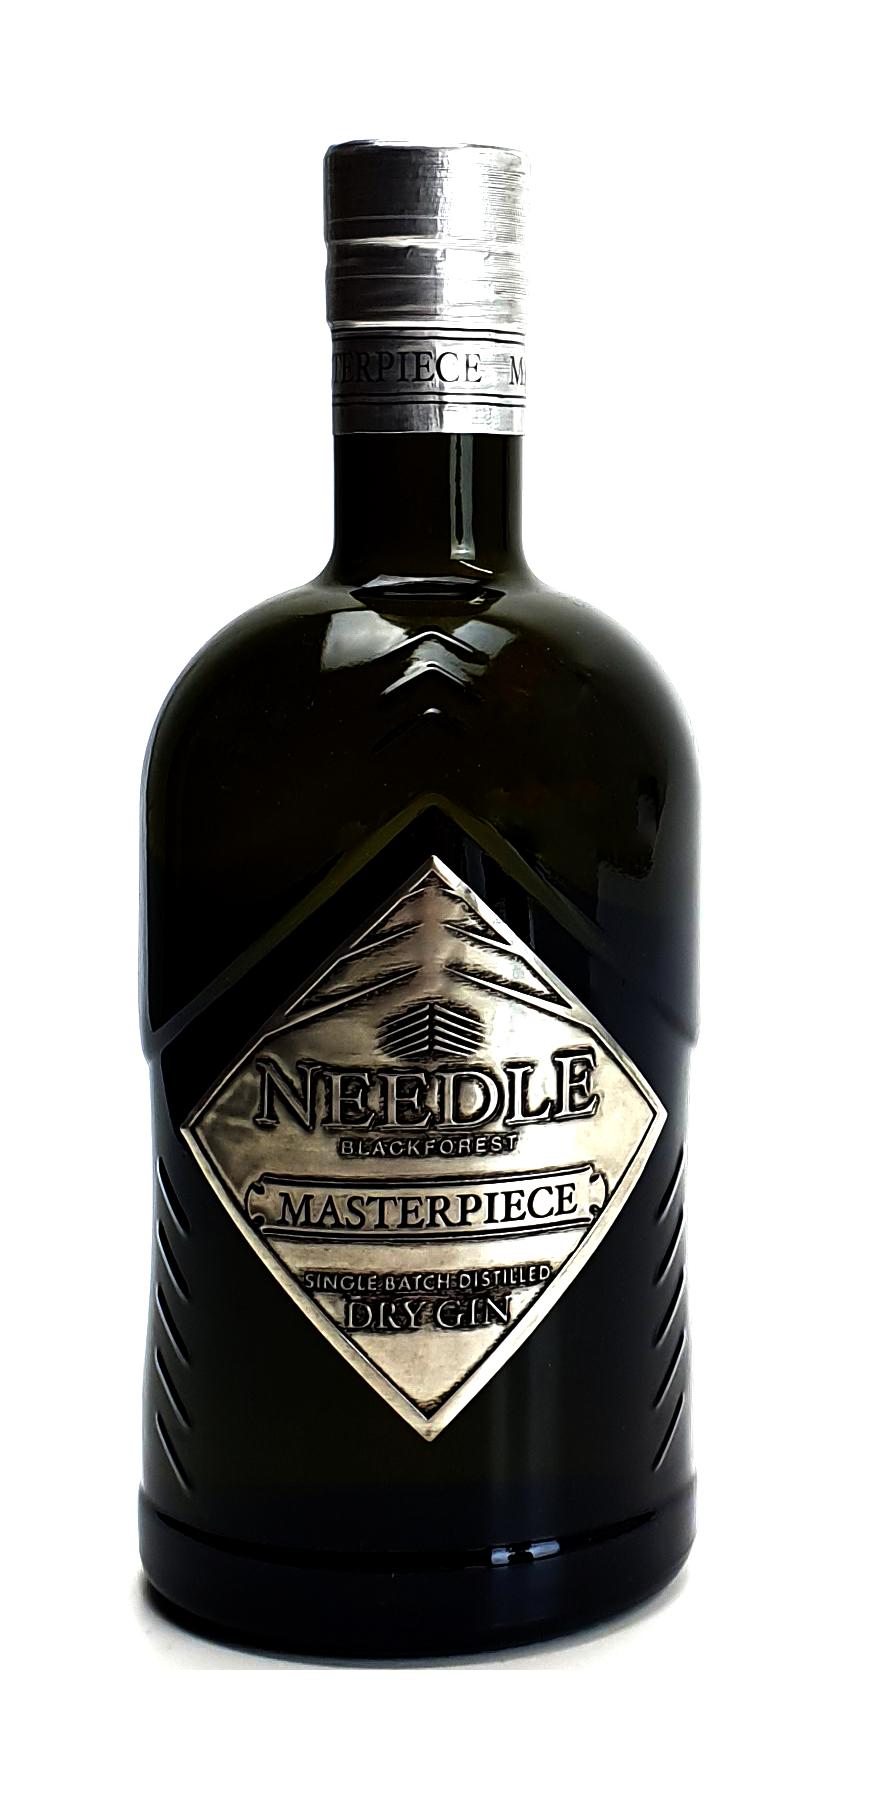 Needle Masterpiece Dry Gin 0,5L (45%Vol)